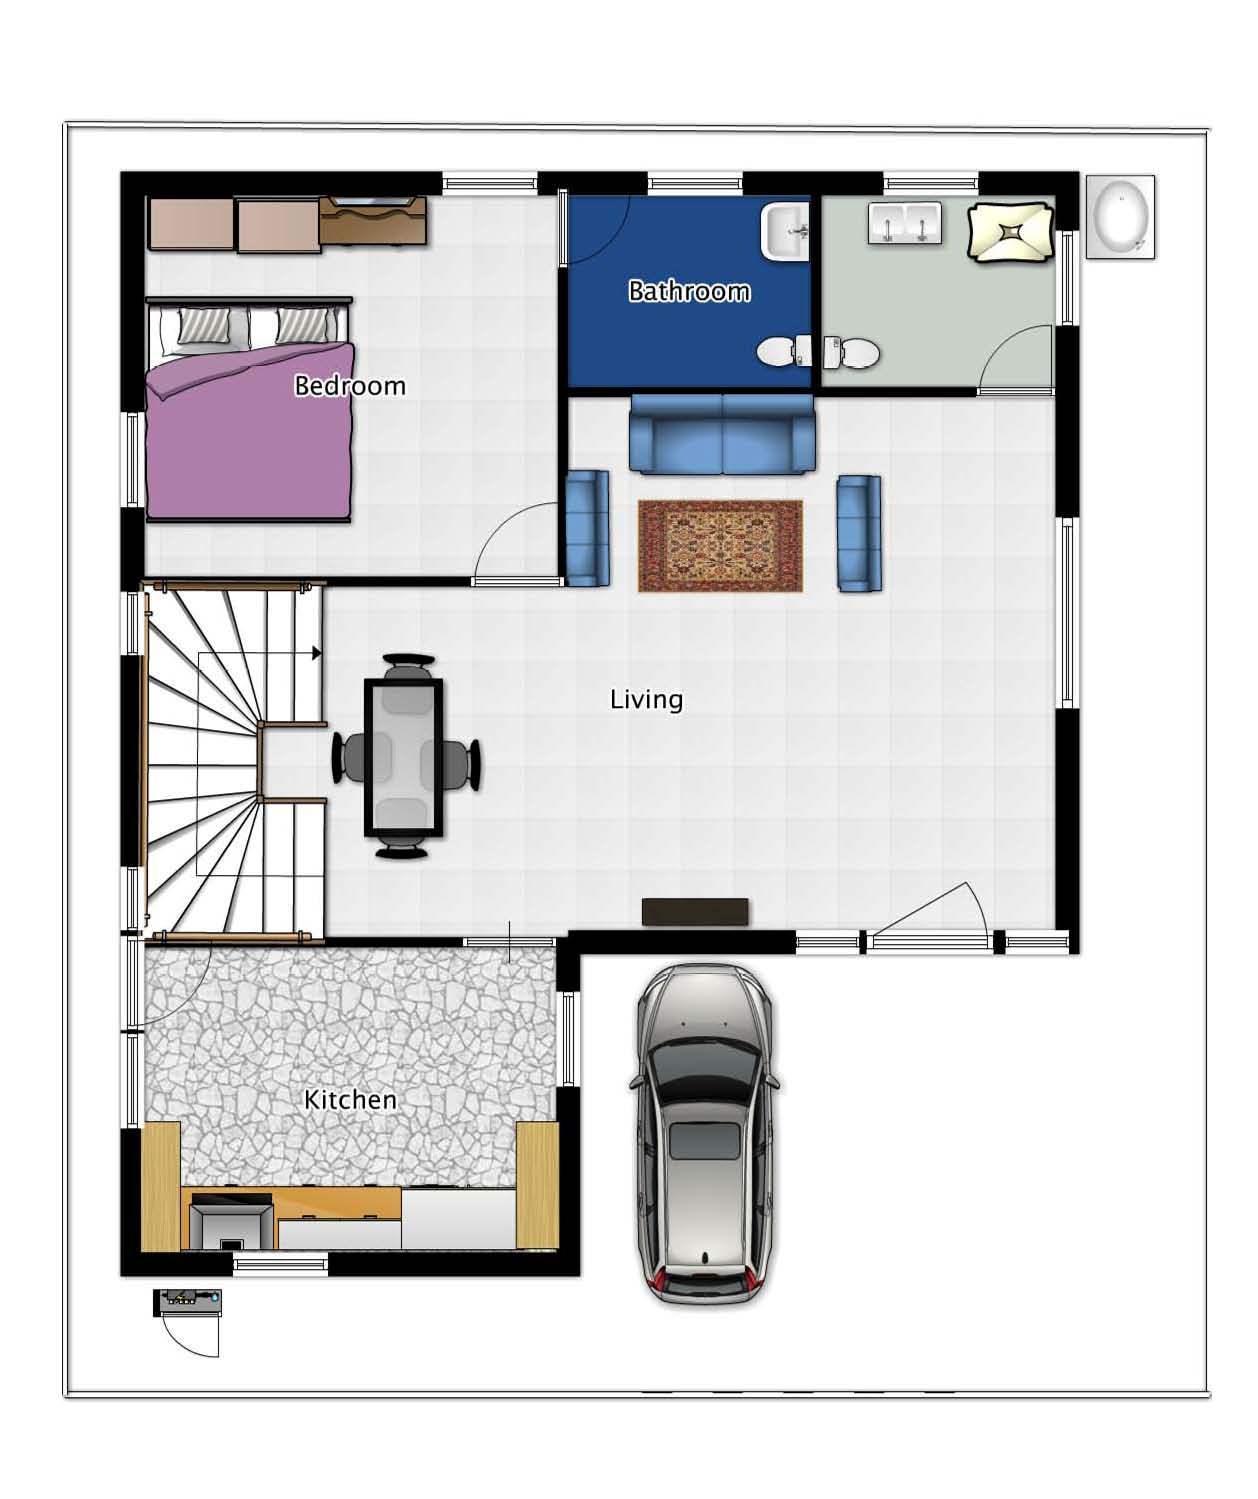 Ground Floor Planing of Duplex....